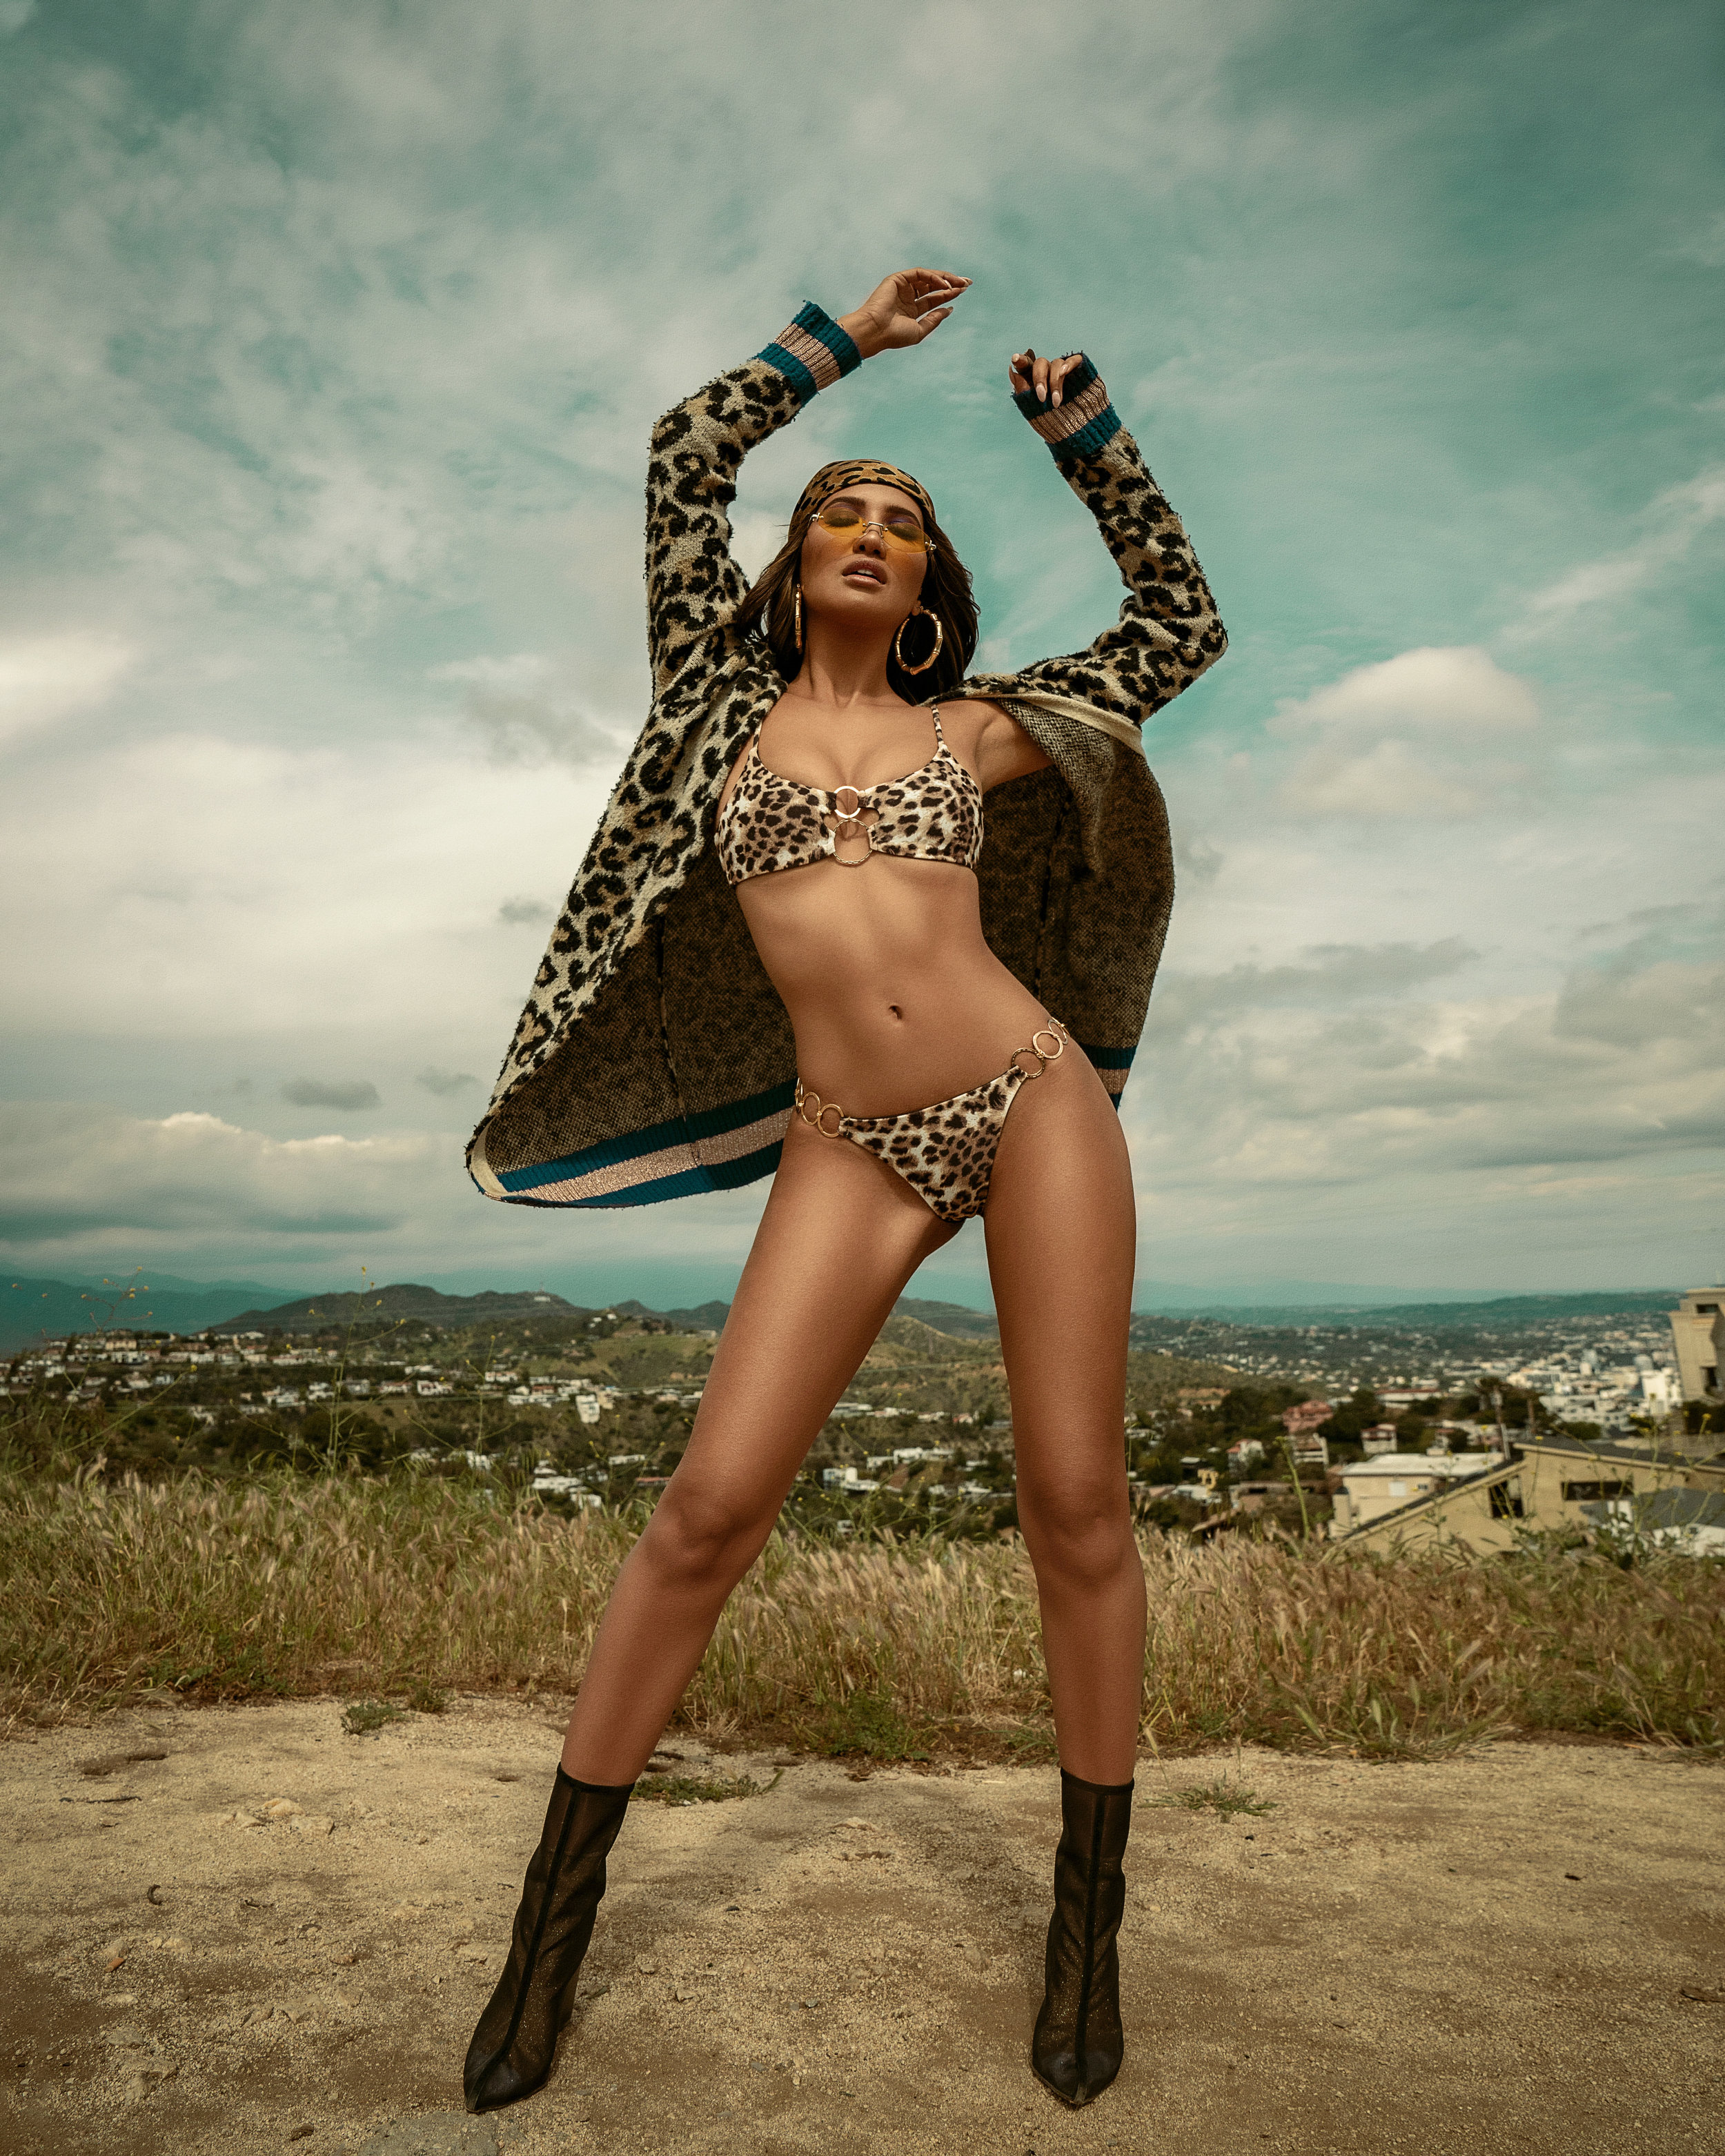 CJ-Bikini-Gifted-Mindset-Photography.jpg